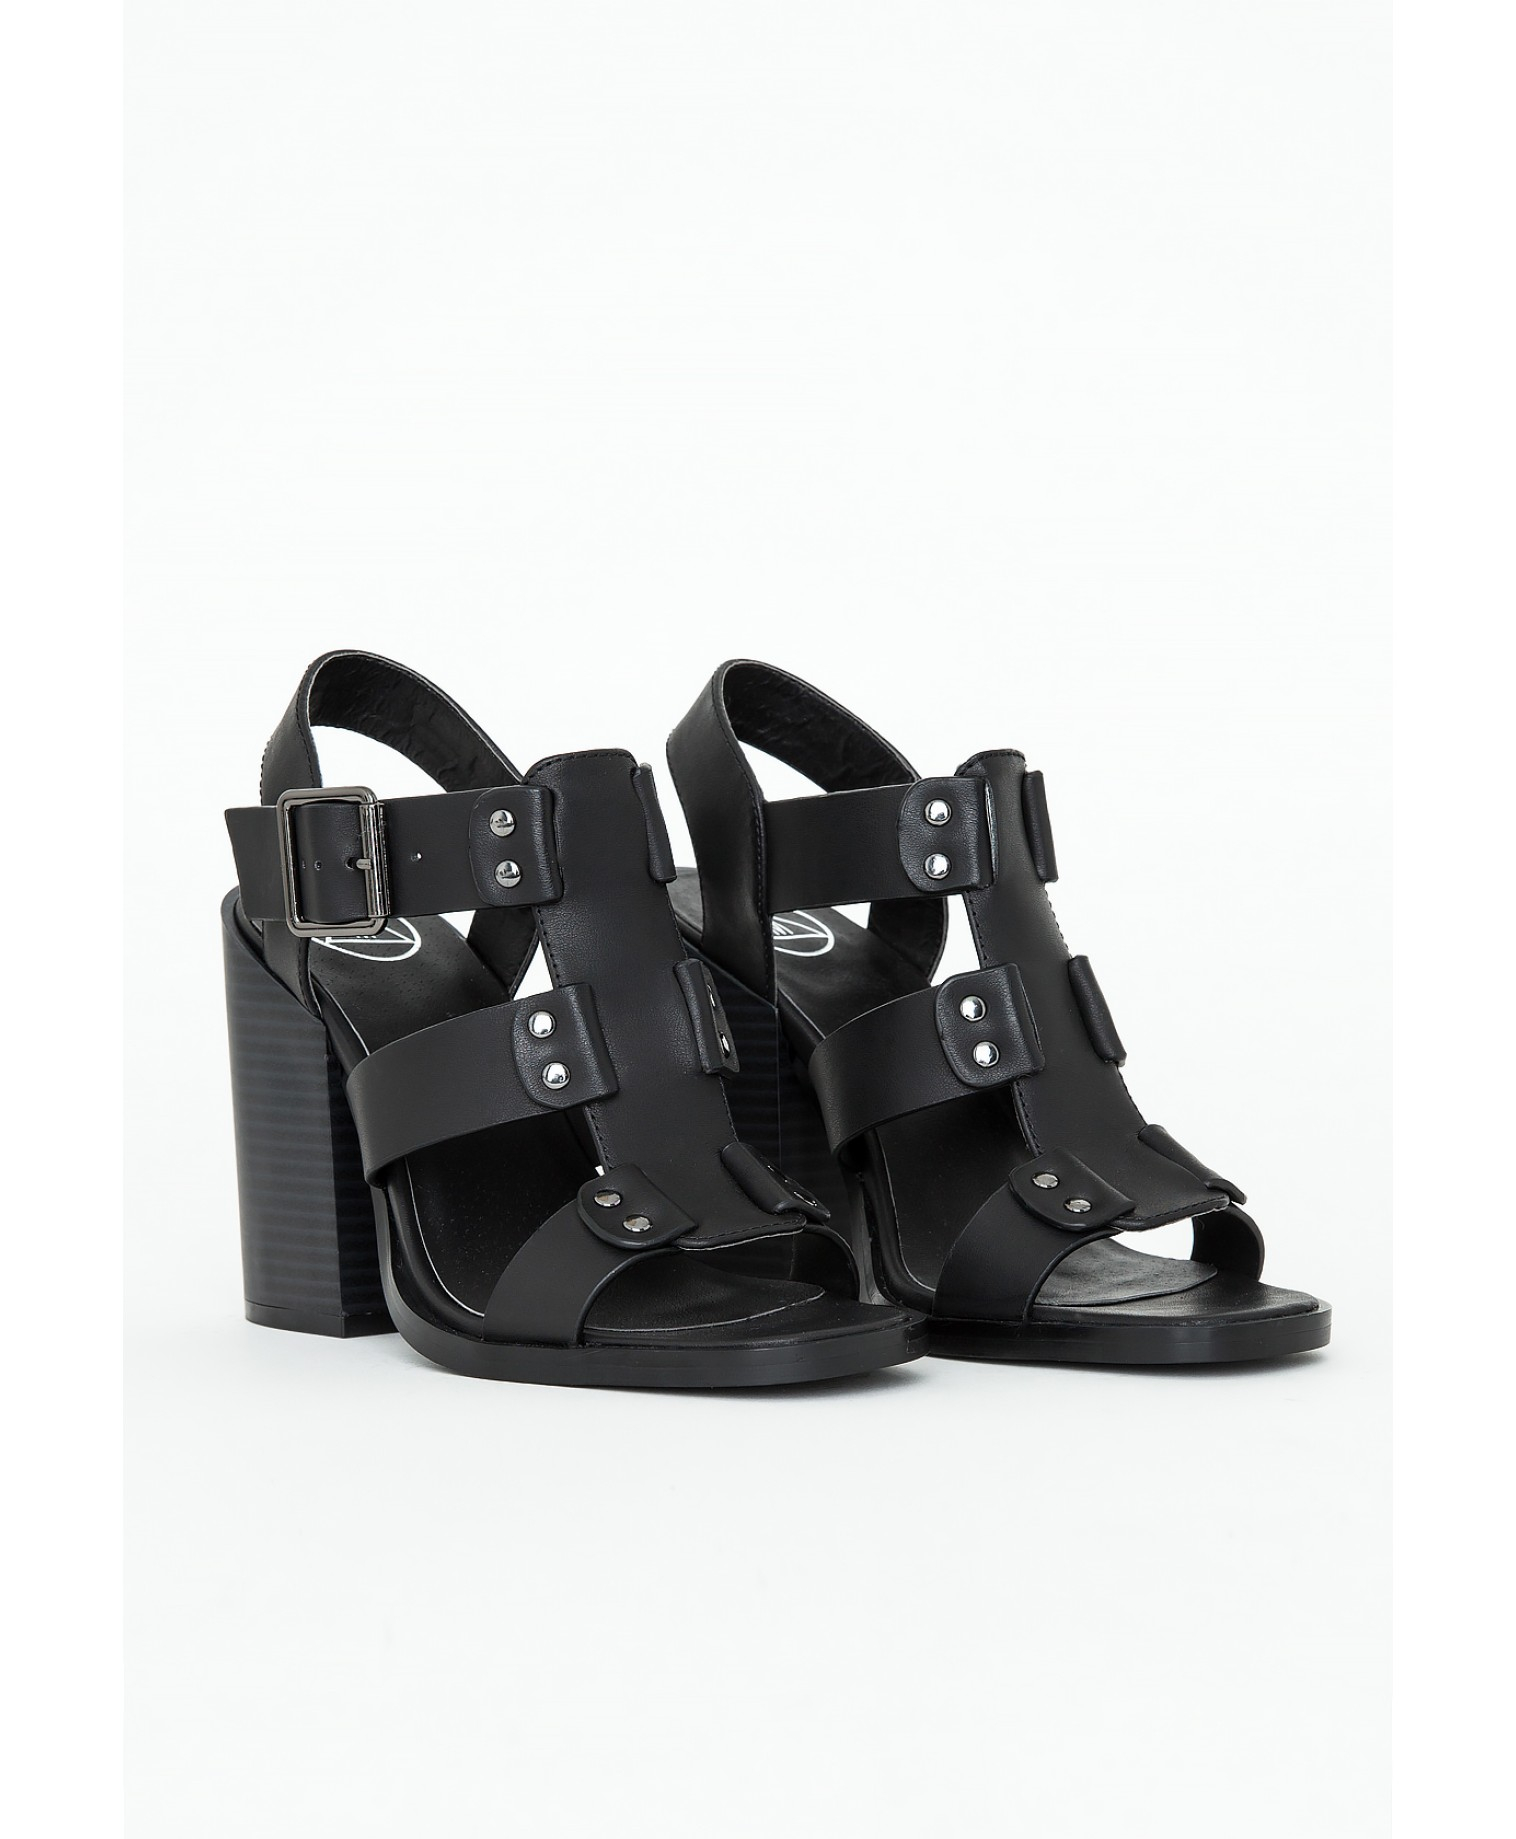 Black Block Heel Gladiator Sandals